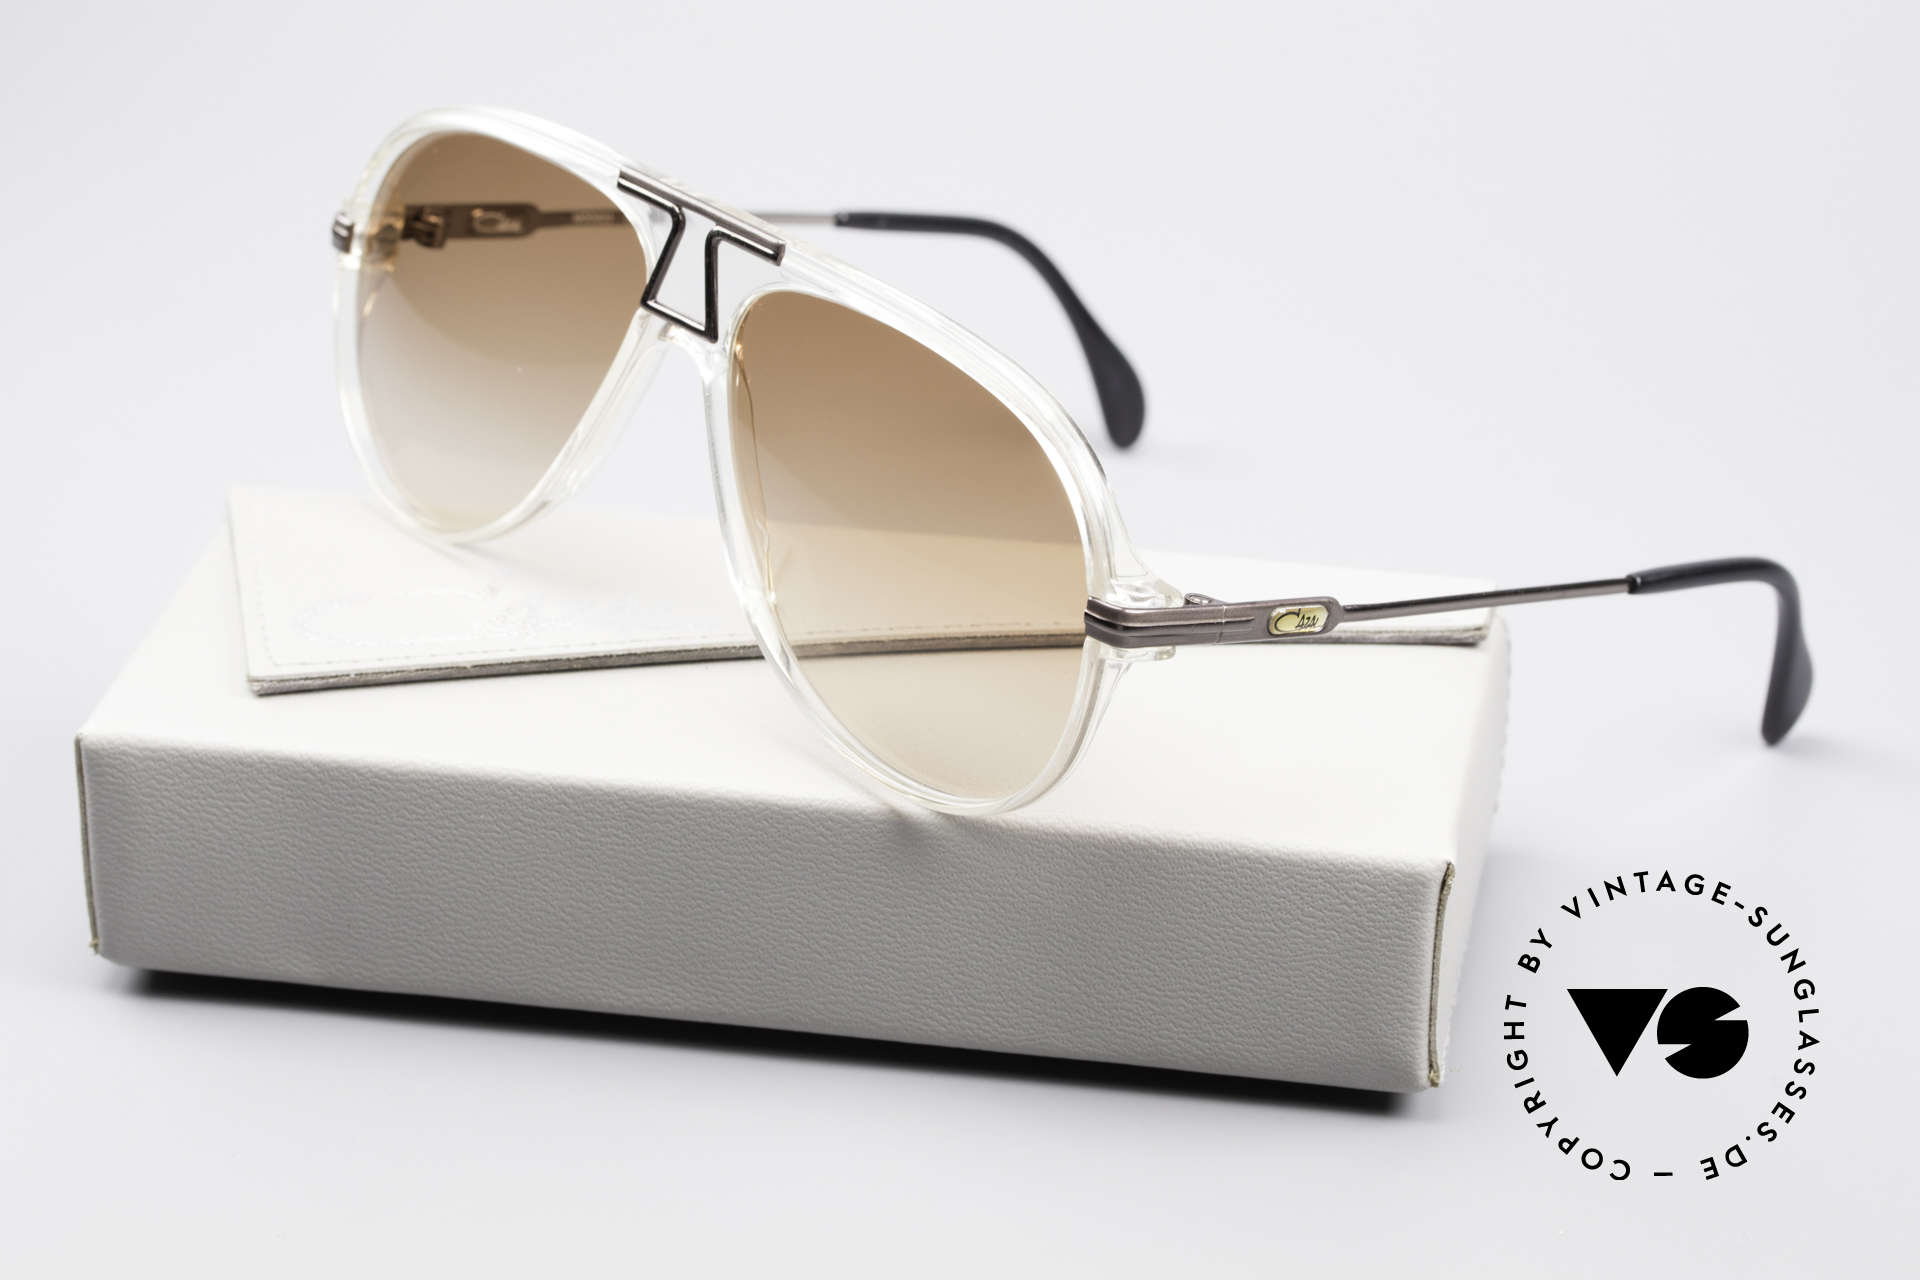 Cazal 622 Vintage 80's Aviator Sunglasses, Size: medium, Made for Men